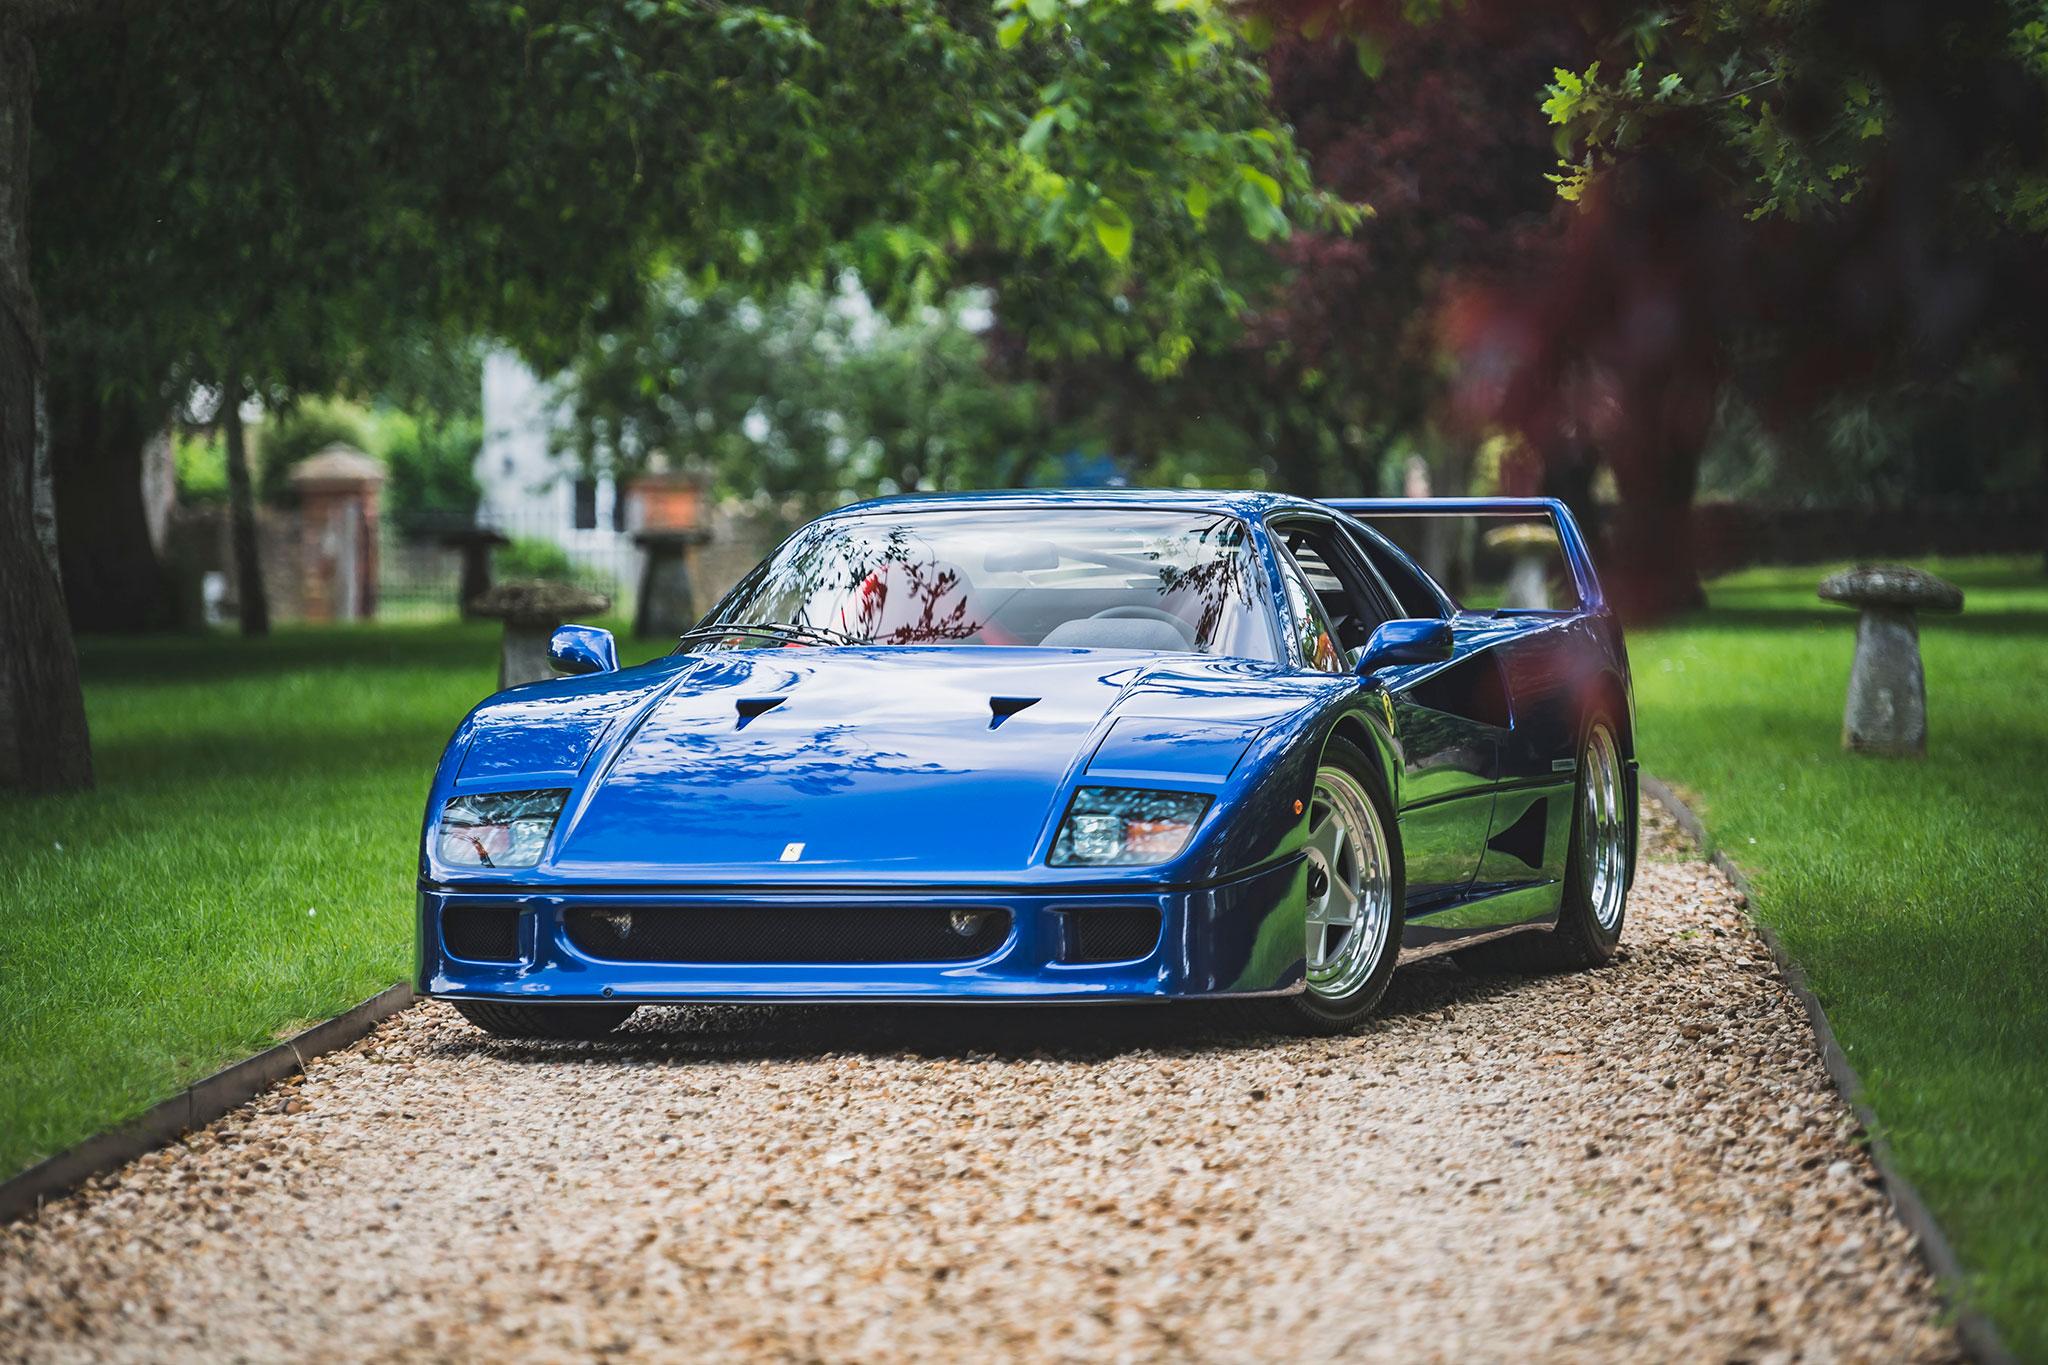 1989 Ferrari F40 bleu métallisé July 2021 record de vente - The Market by Bonhams.